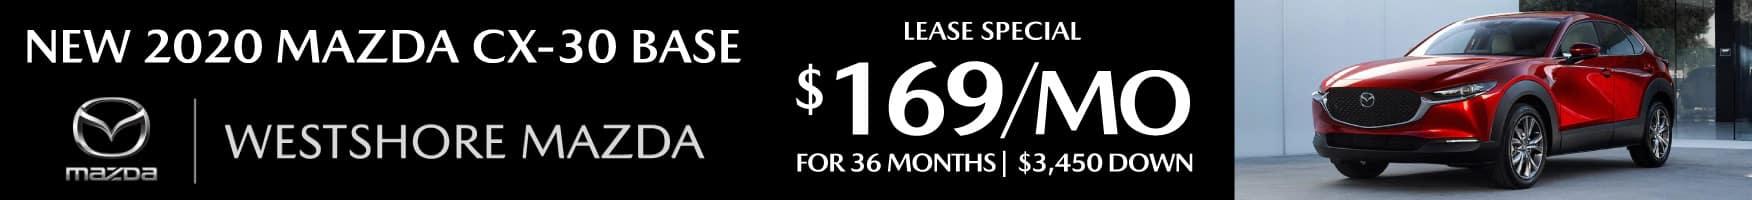 Mazda cx-30 base lease special